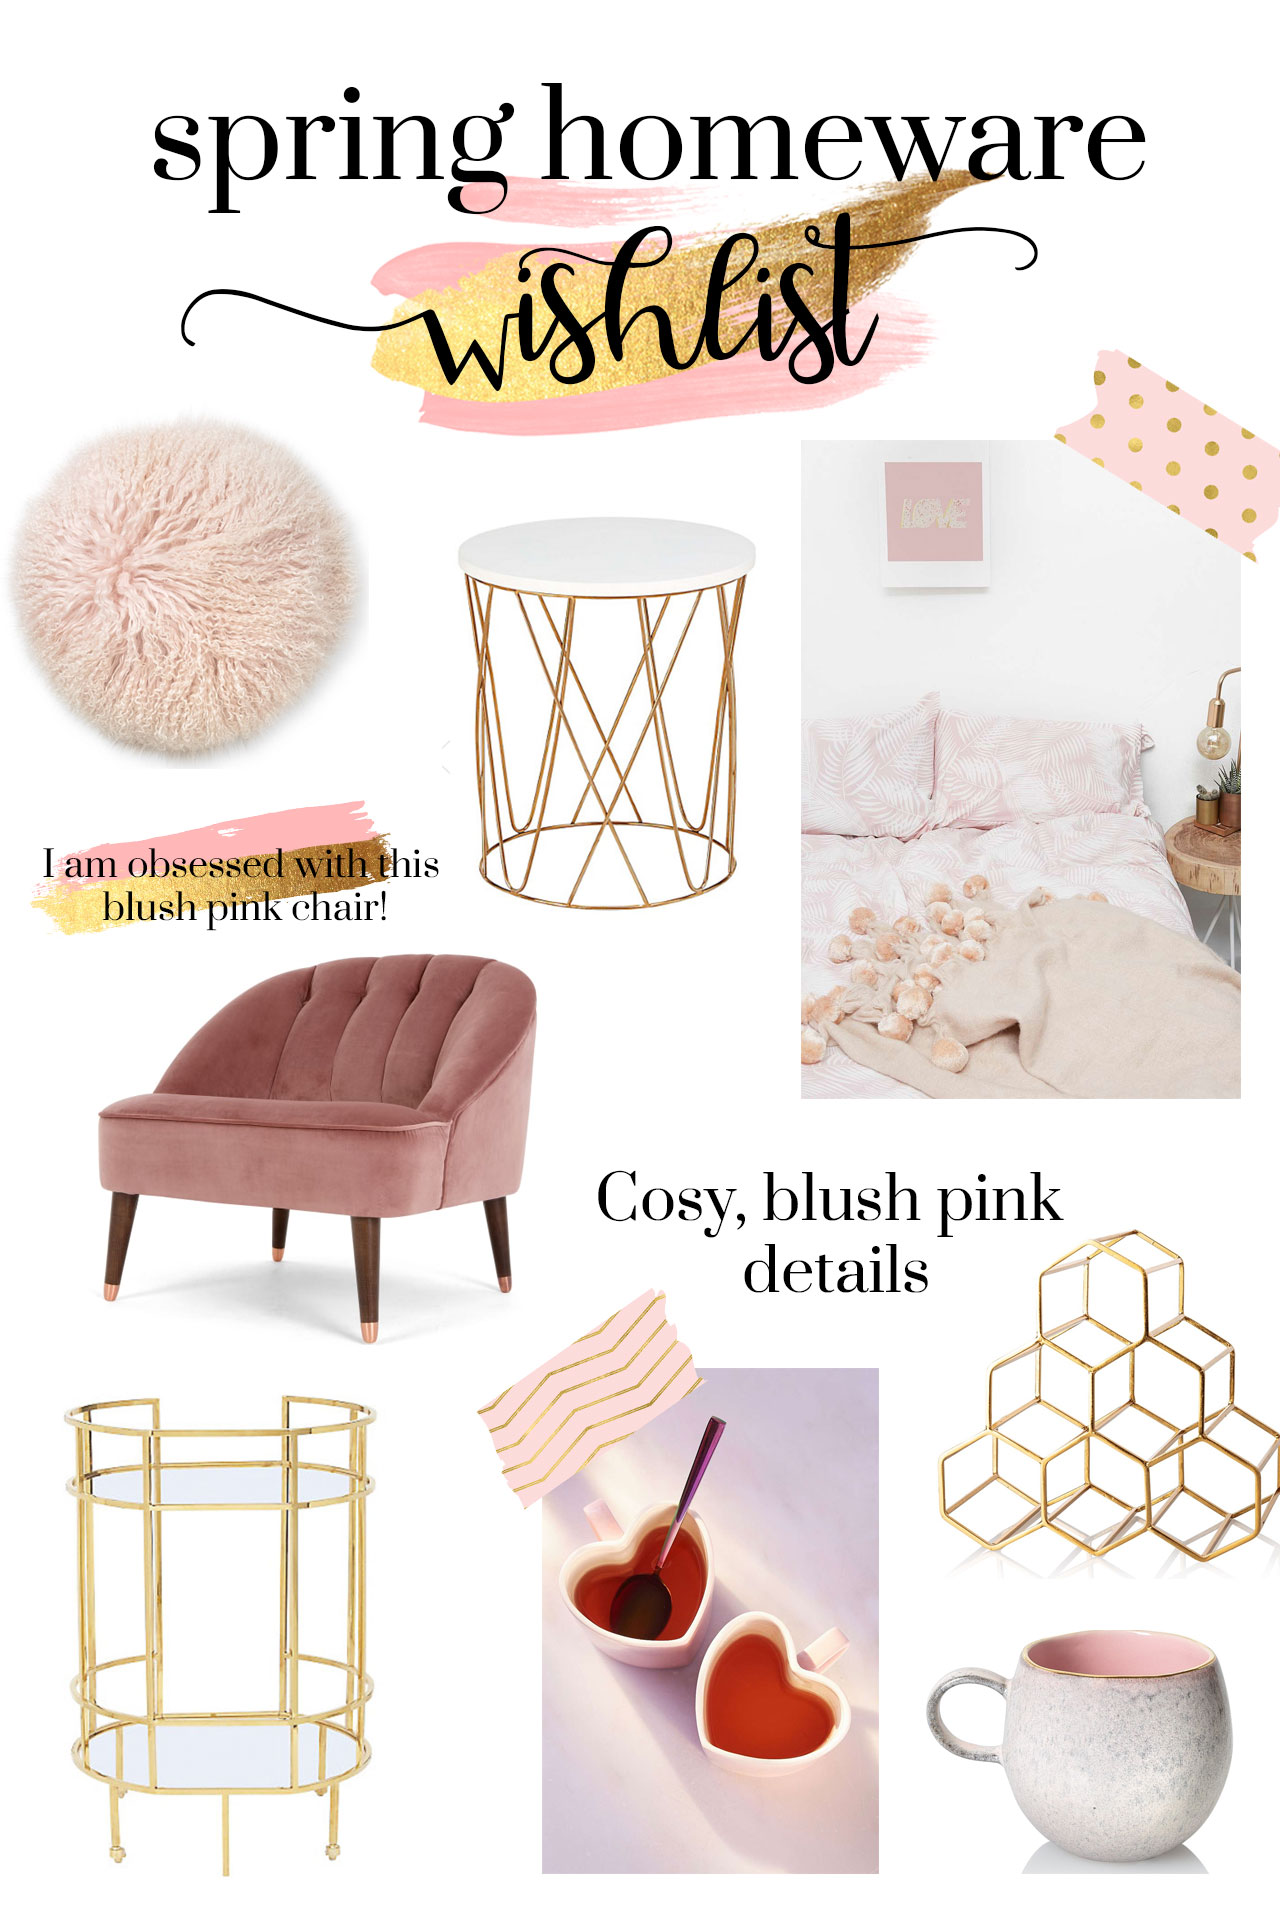 spring homeware wish list. blush pink, gold interiors